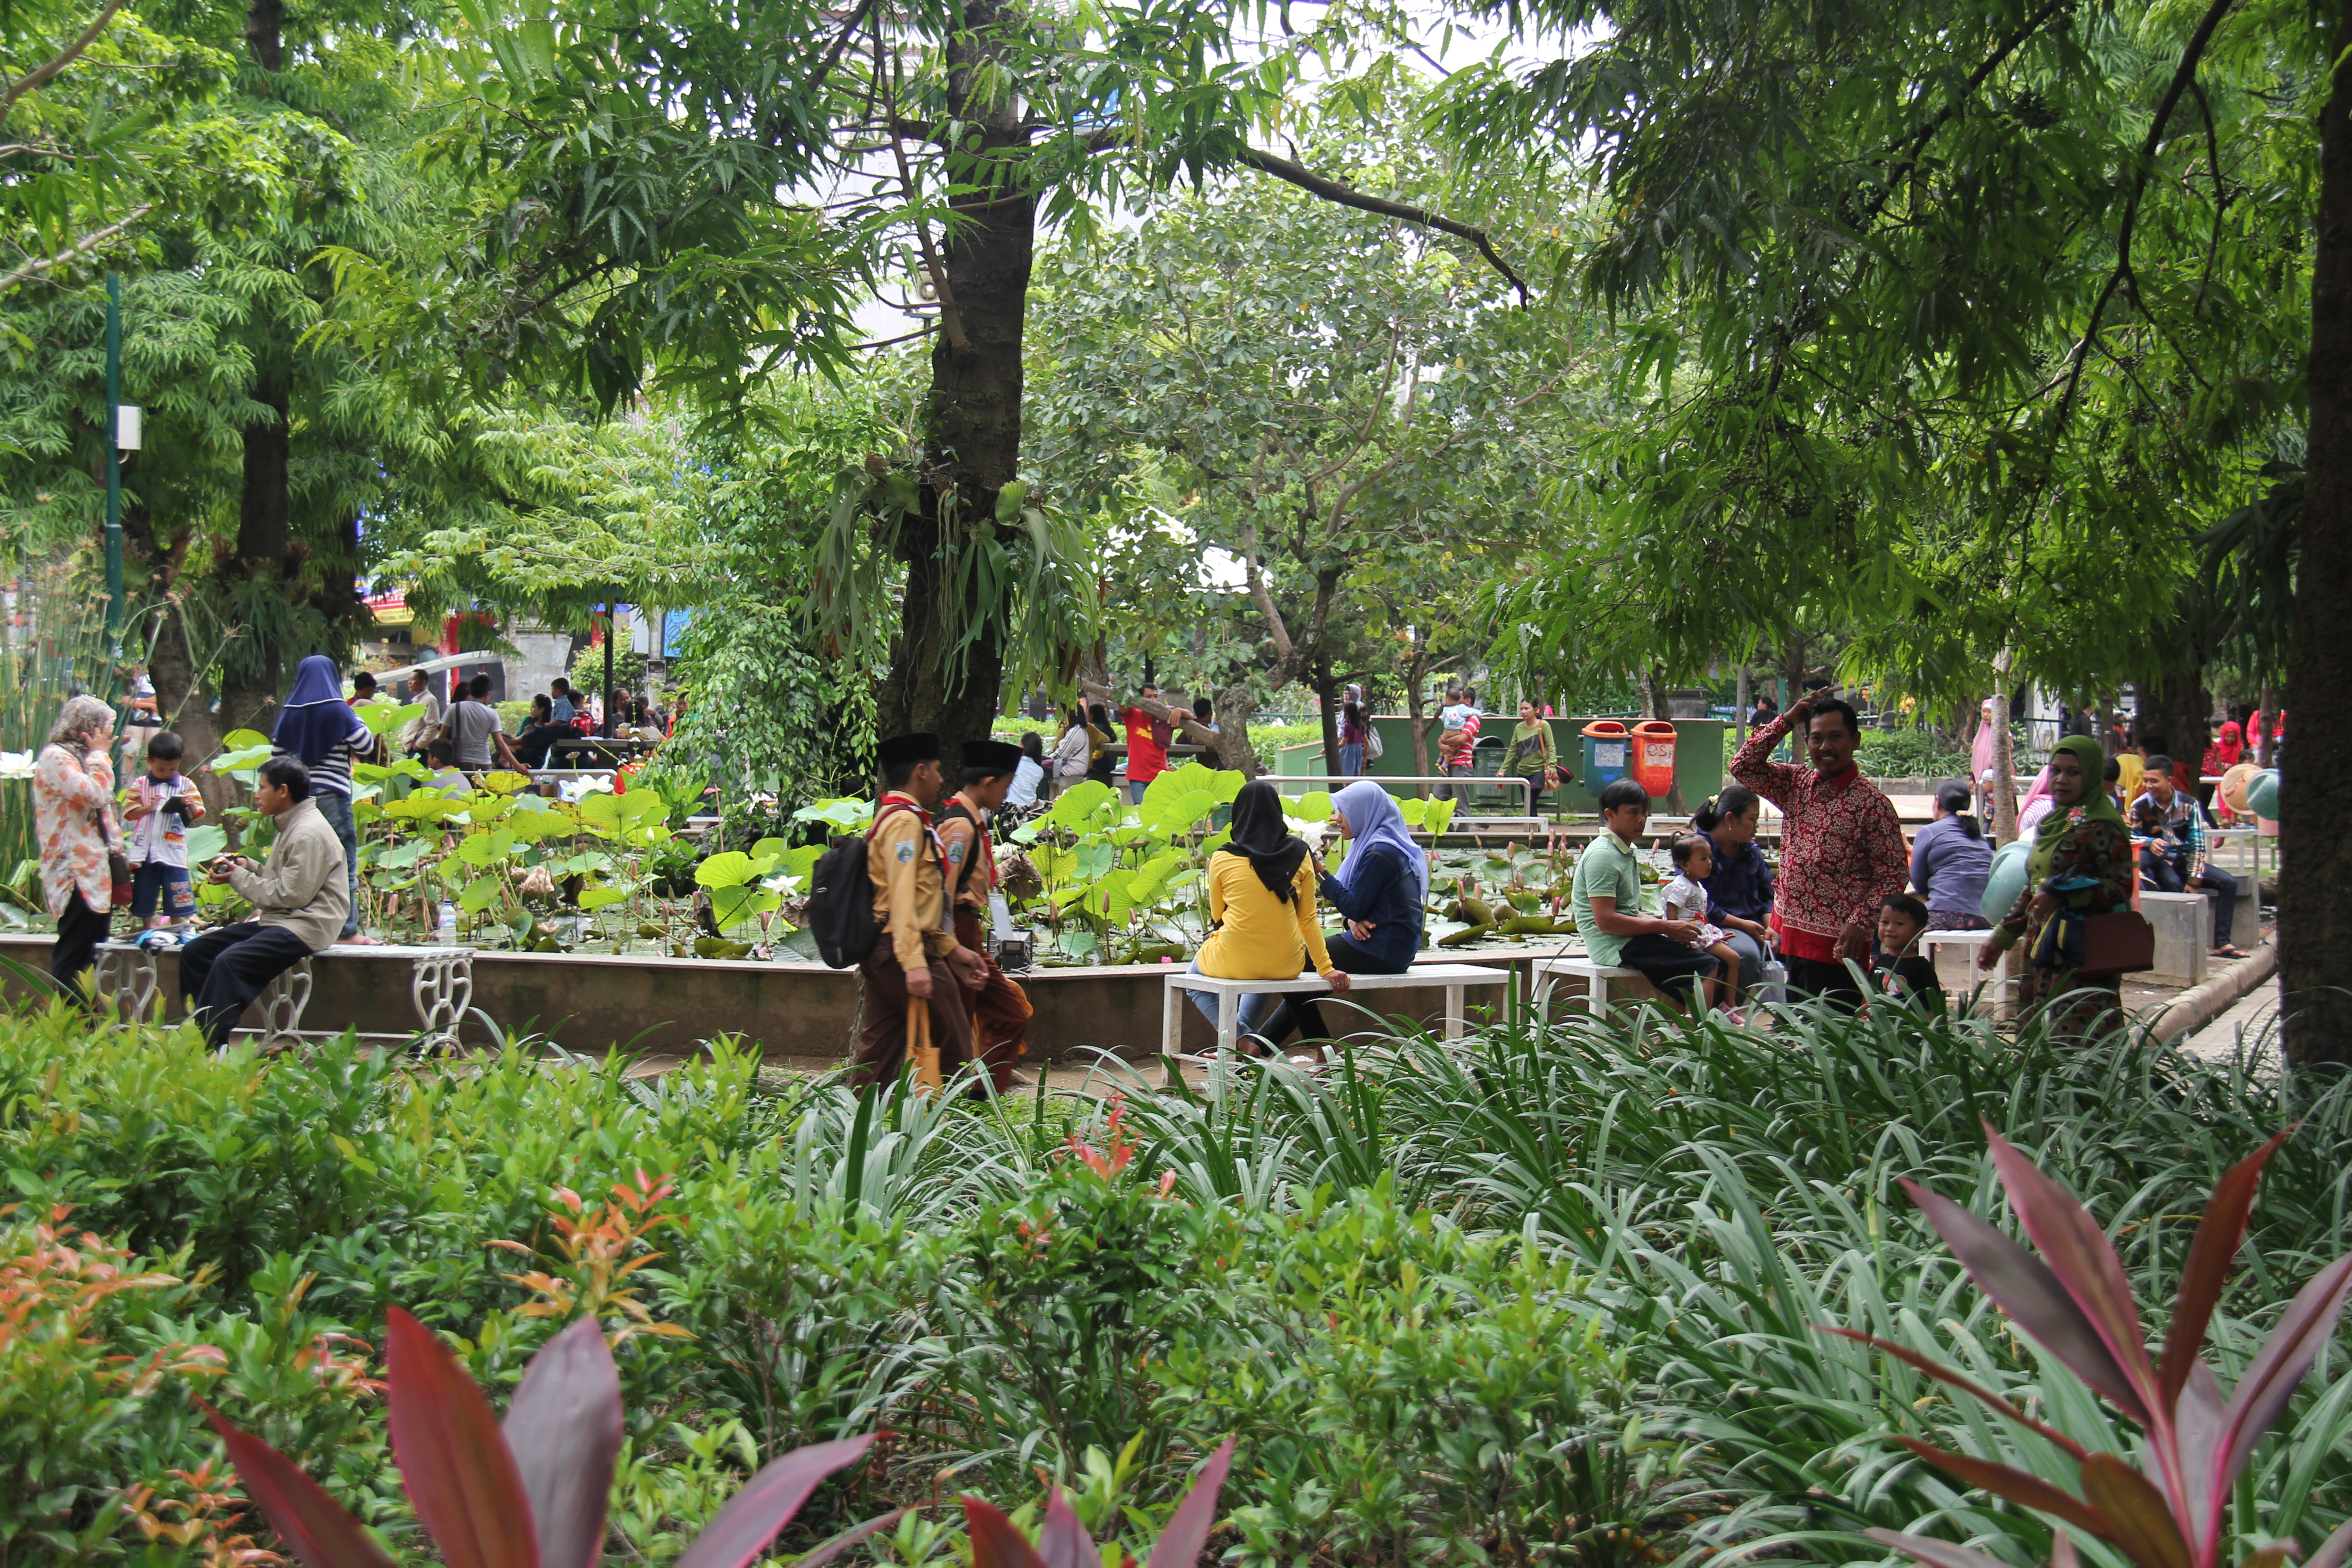 Aloon Tulungagung Sunday Pemerintah Kab Taman